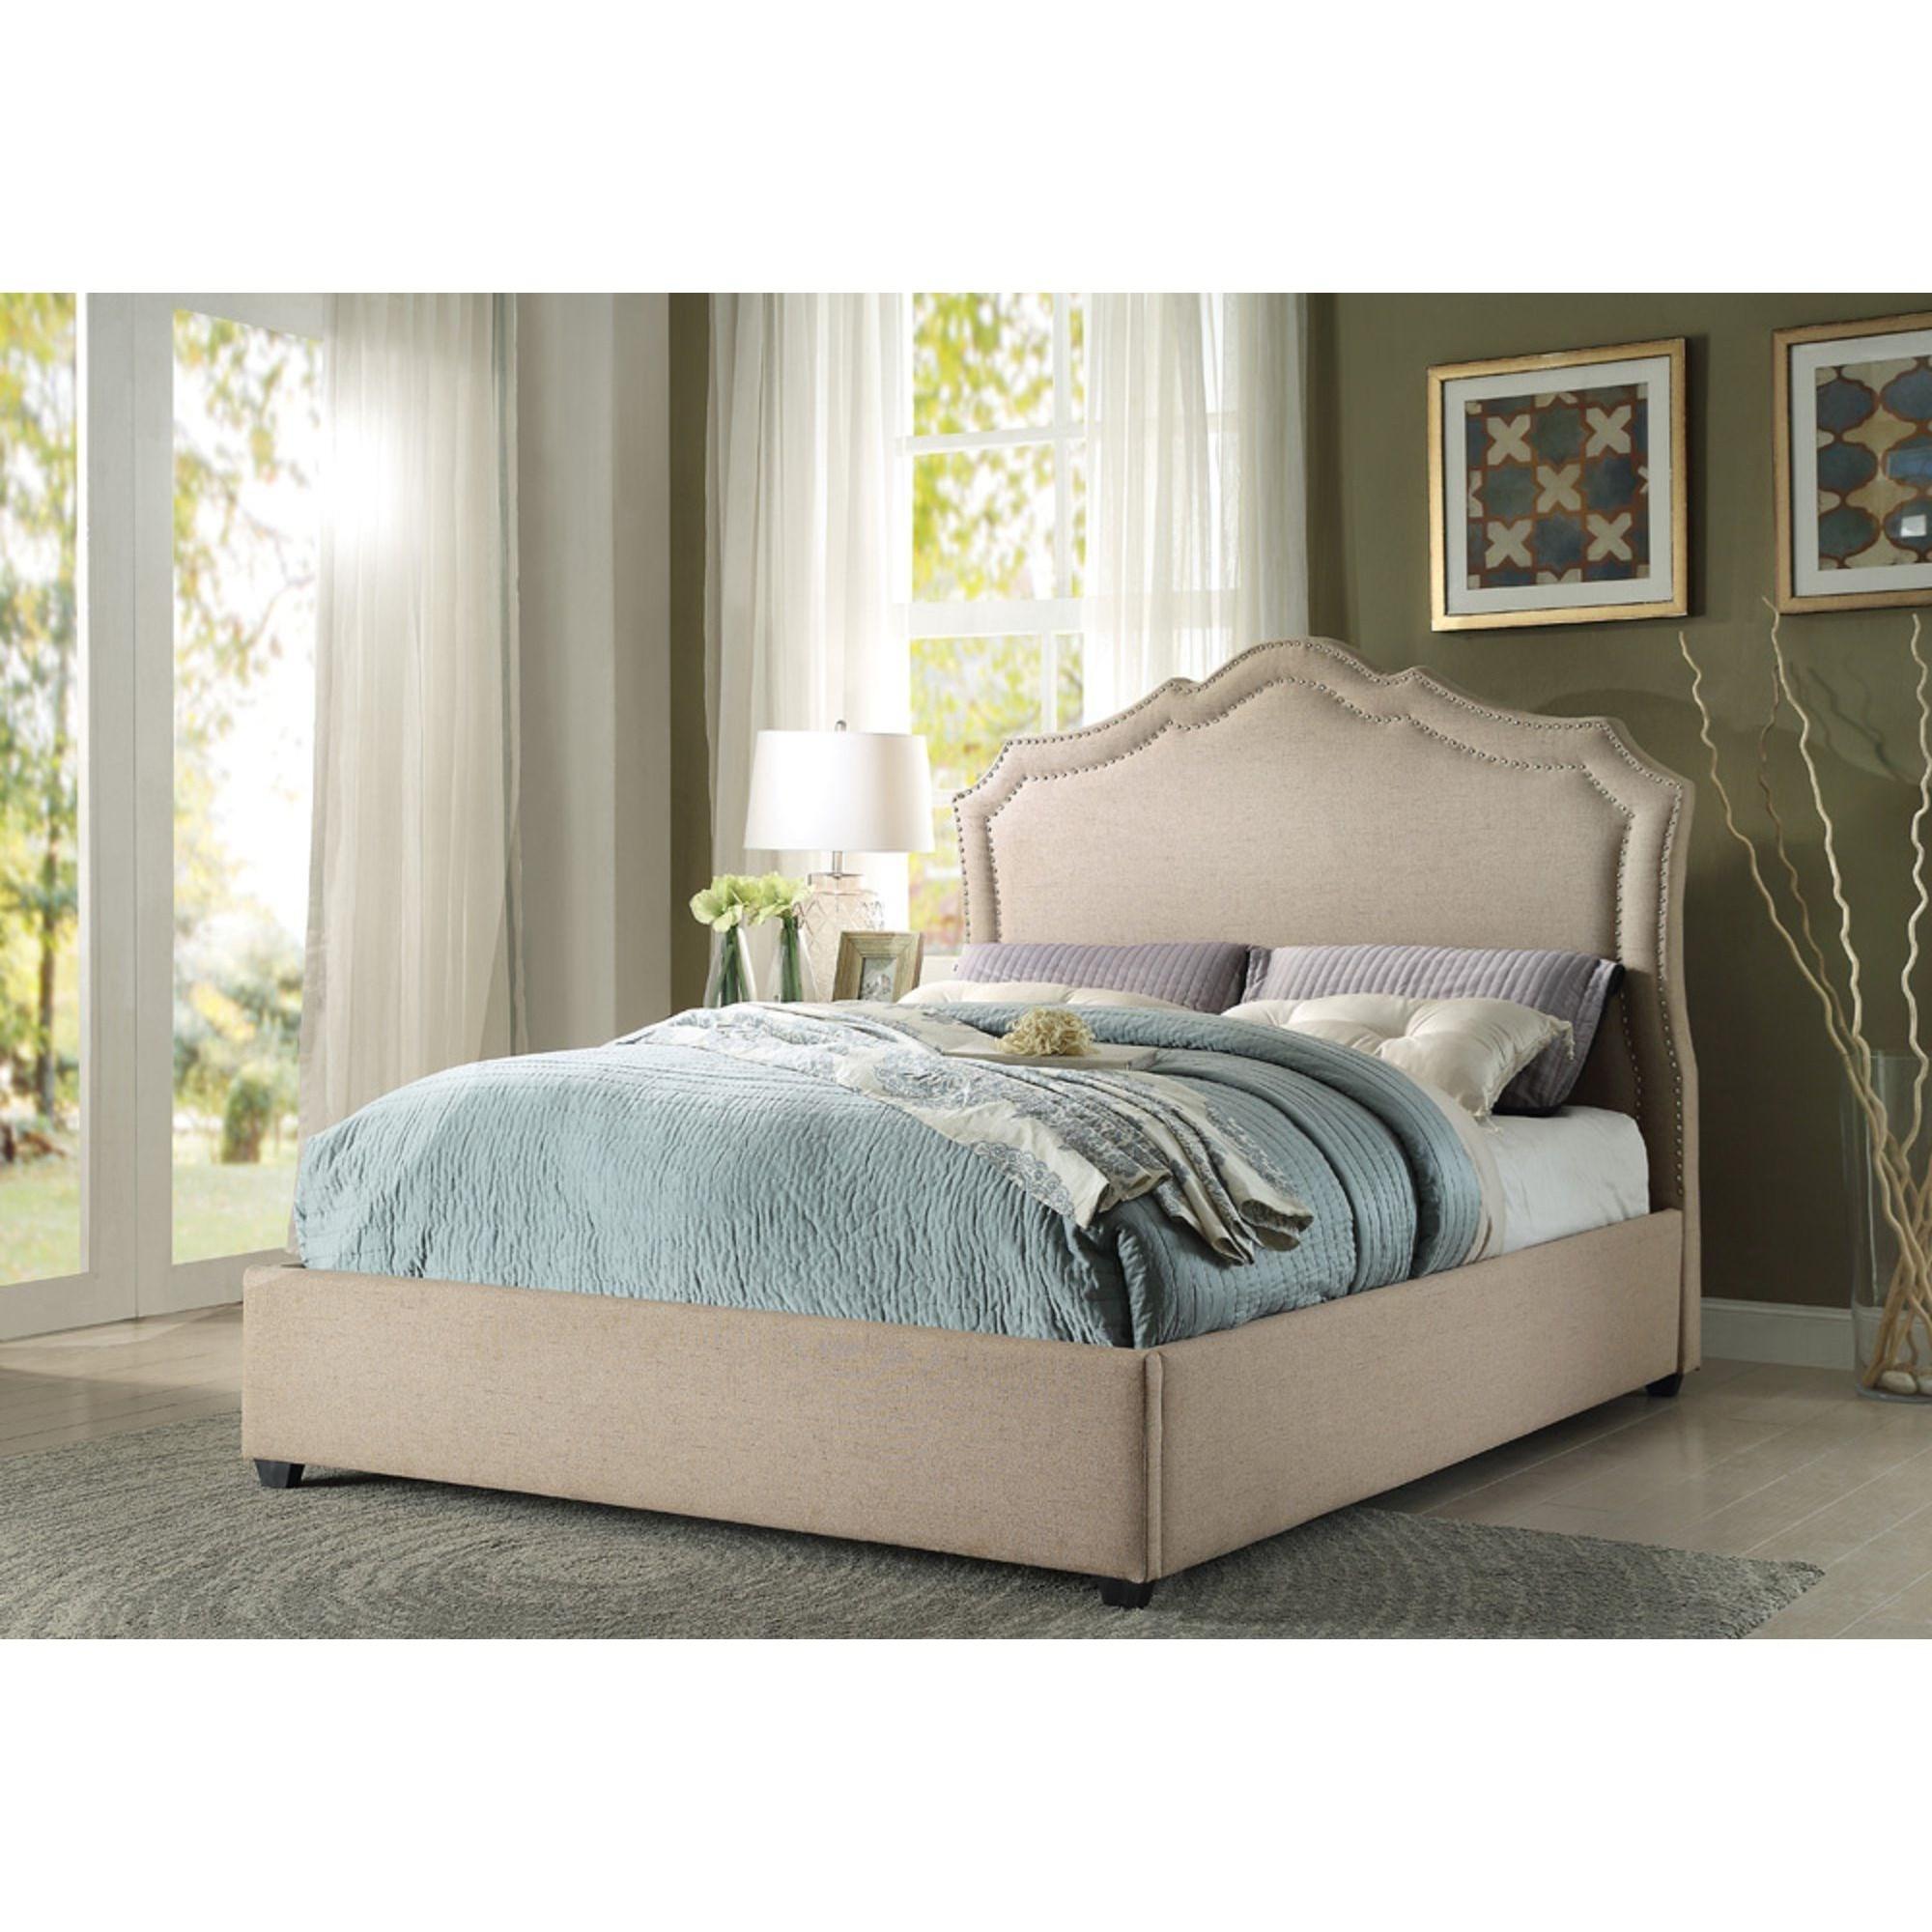 Homelegance Delphine Transitional Queen Low Profile Bed - Item Number: 1884N-1+2+3